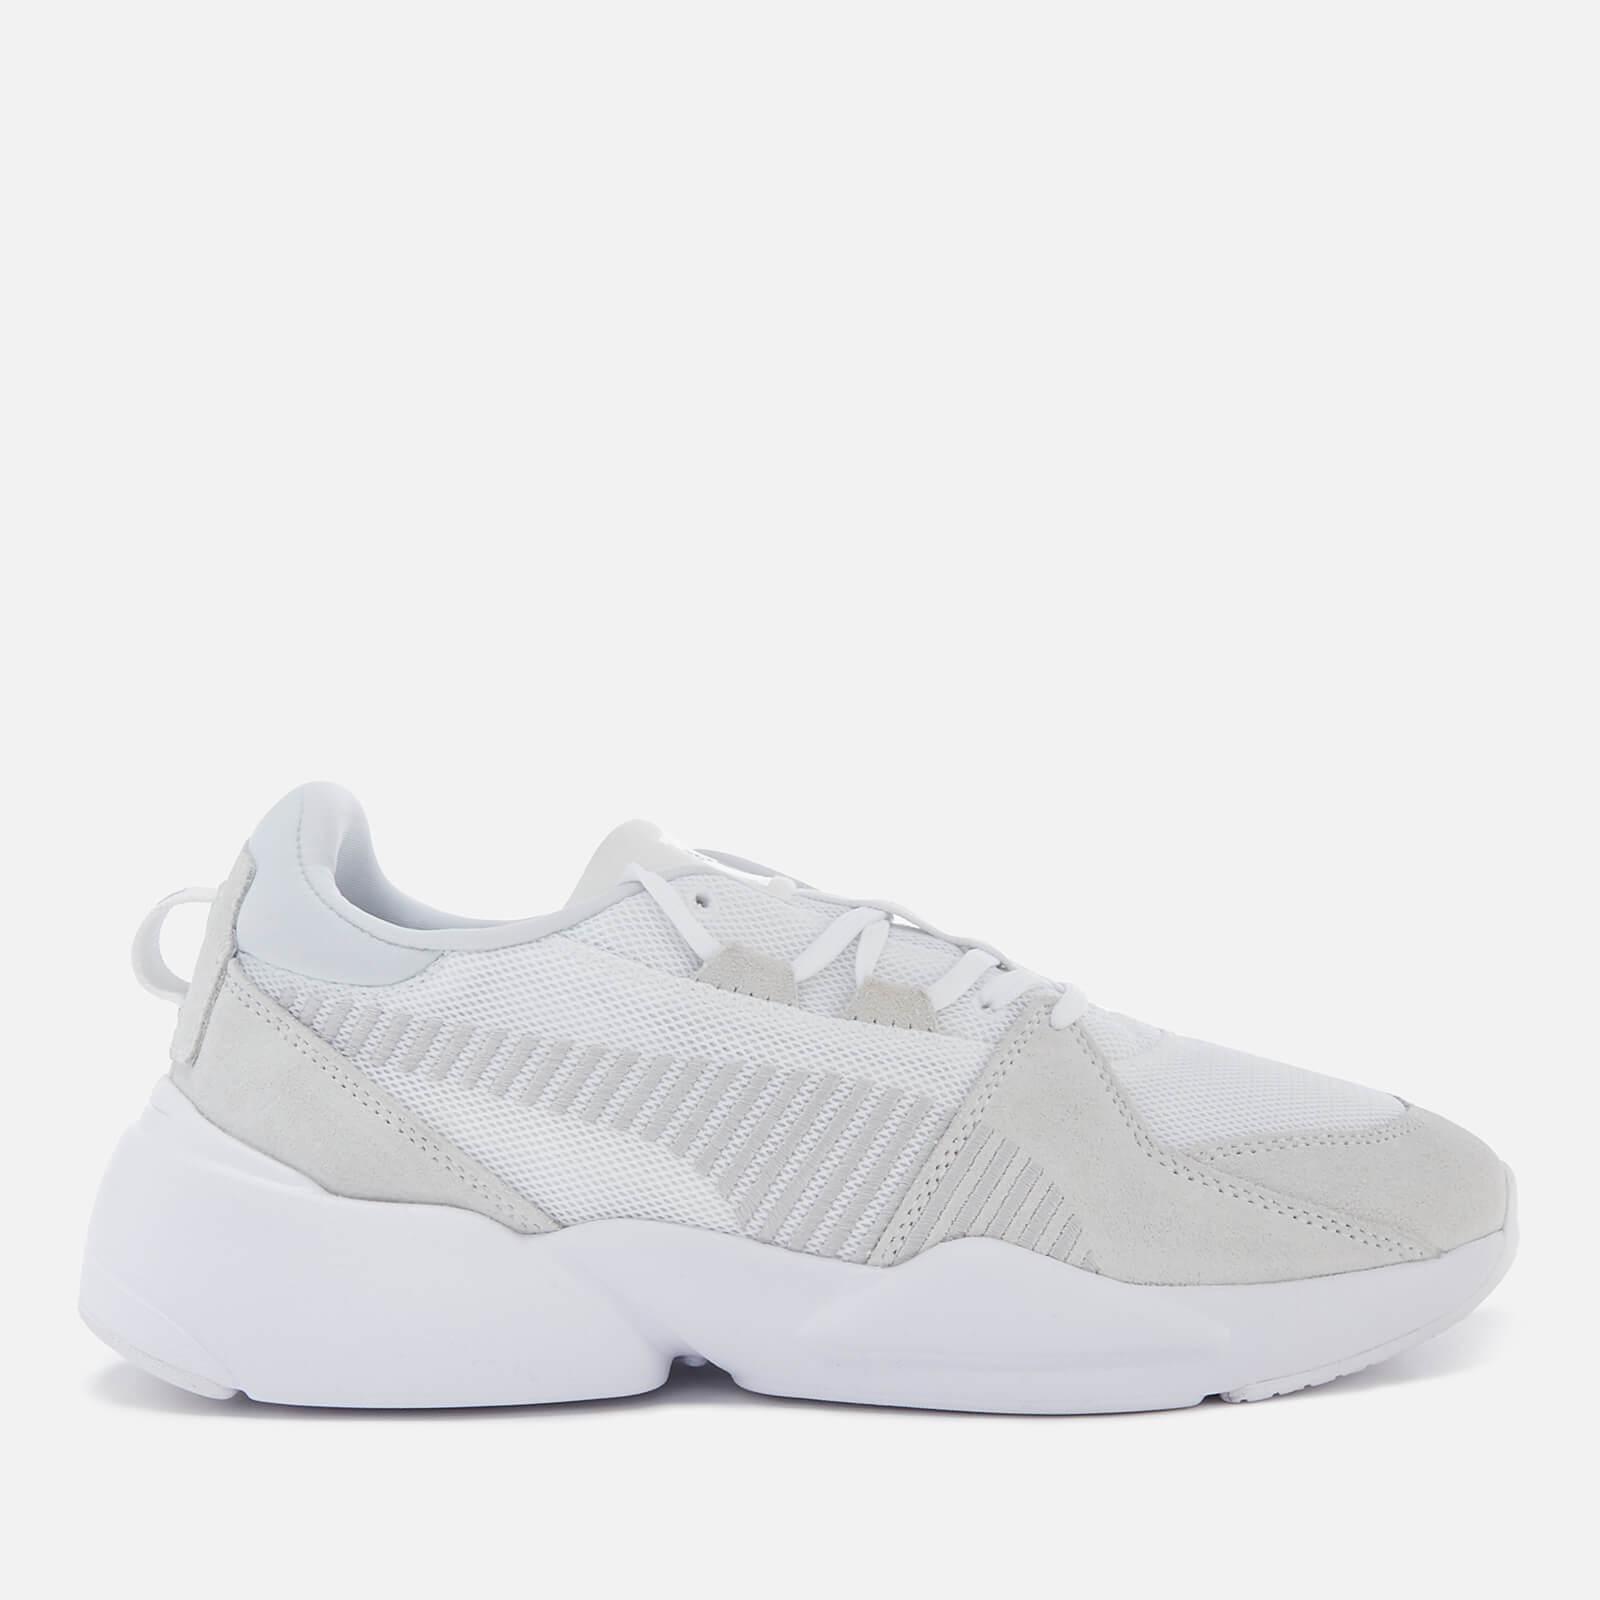 92ca104cbd99 Puma Men s Zeta Suede Trainers - Puma White Glacier Grey Mens Footwear